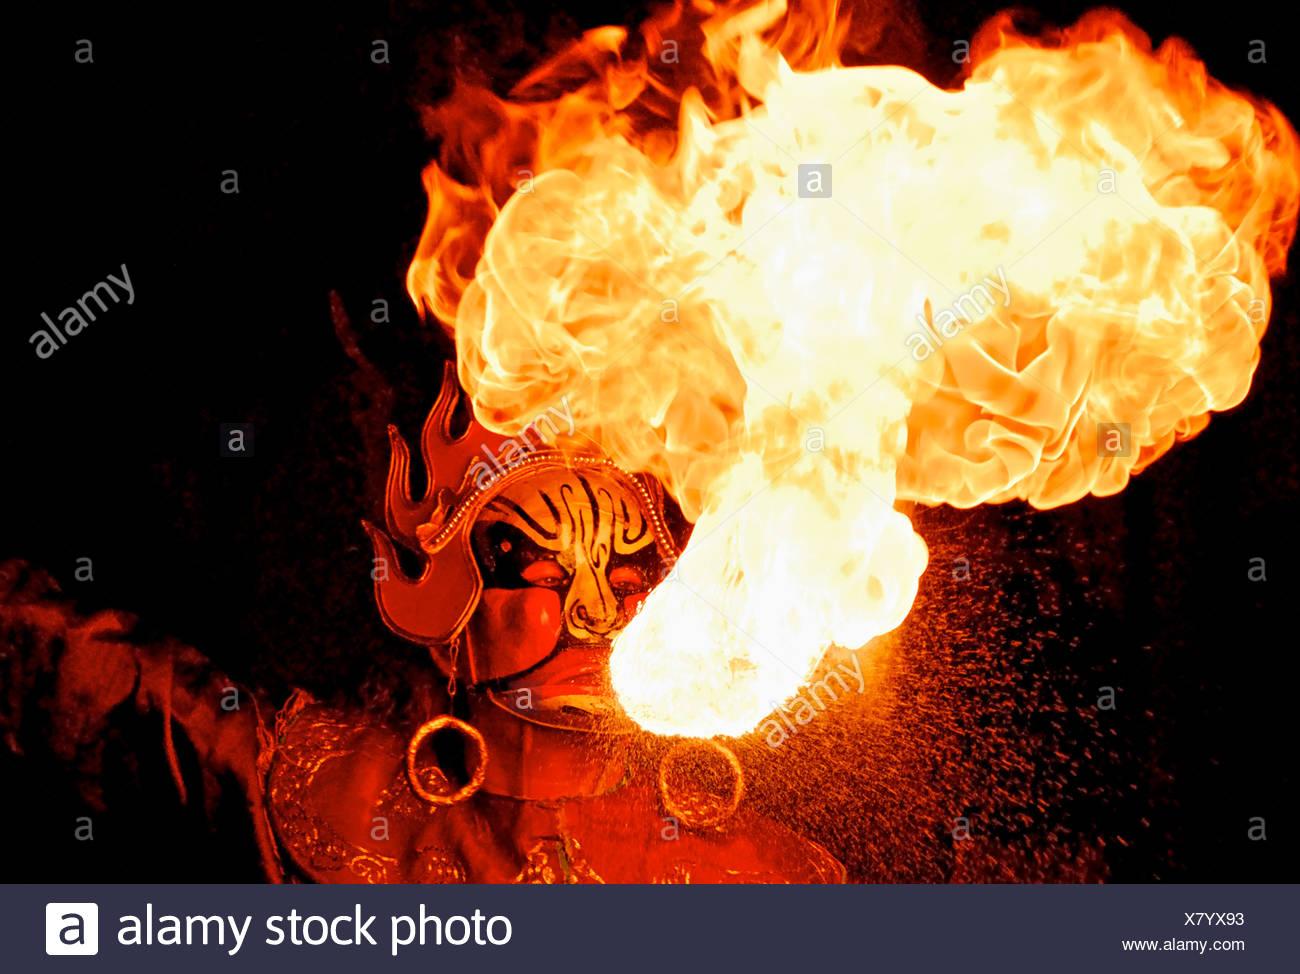 Fire spitter at Sichuan Opera Chengdu China - Stock Image